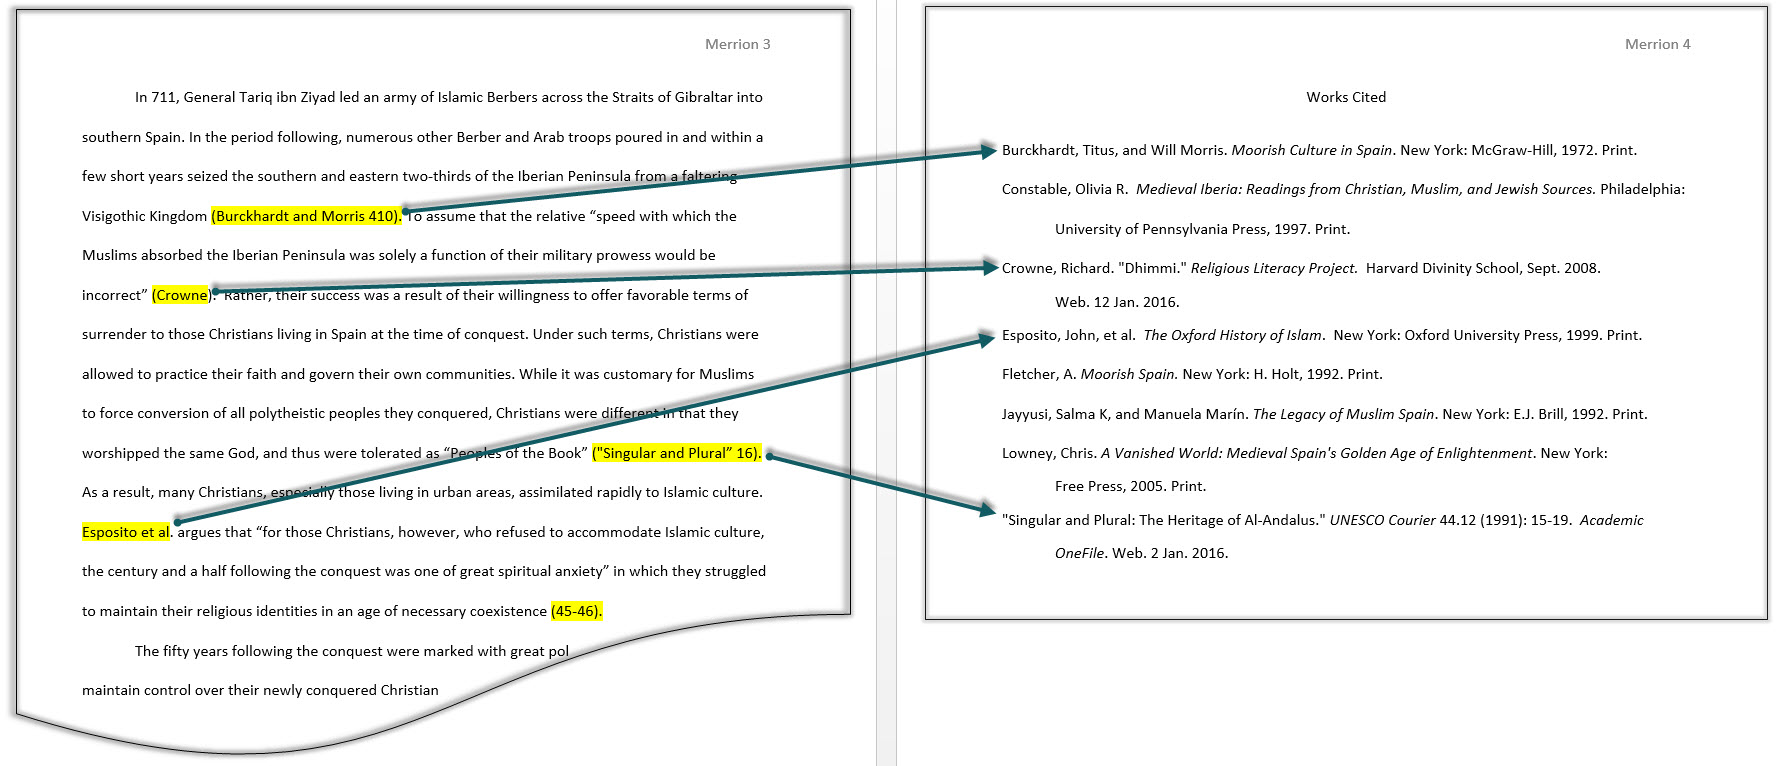 Mla Essay Mla Essay Format Endnotes << Homework Writing Service Mla